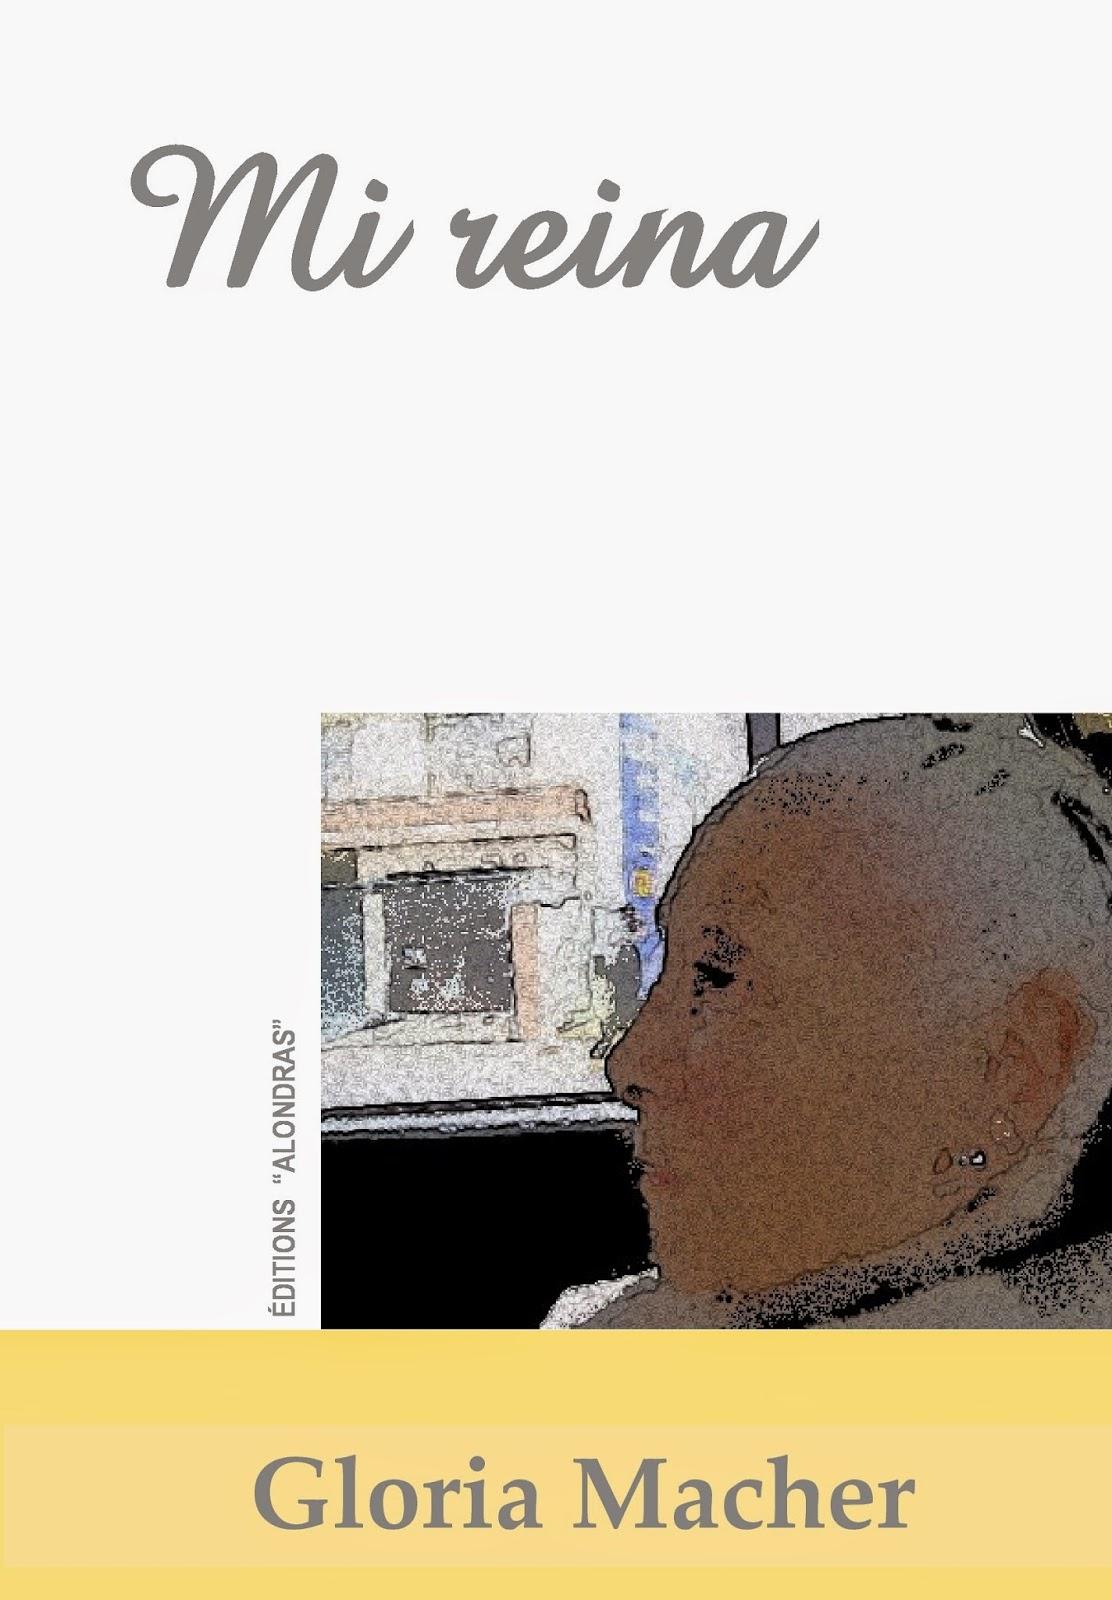 Novedad literaria: 'Mi Reina' de Gloria Macher